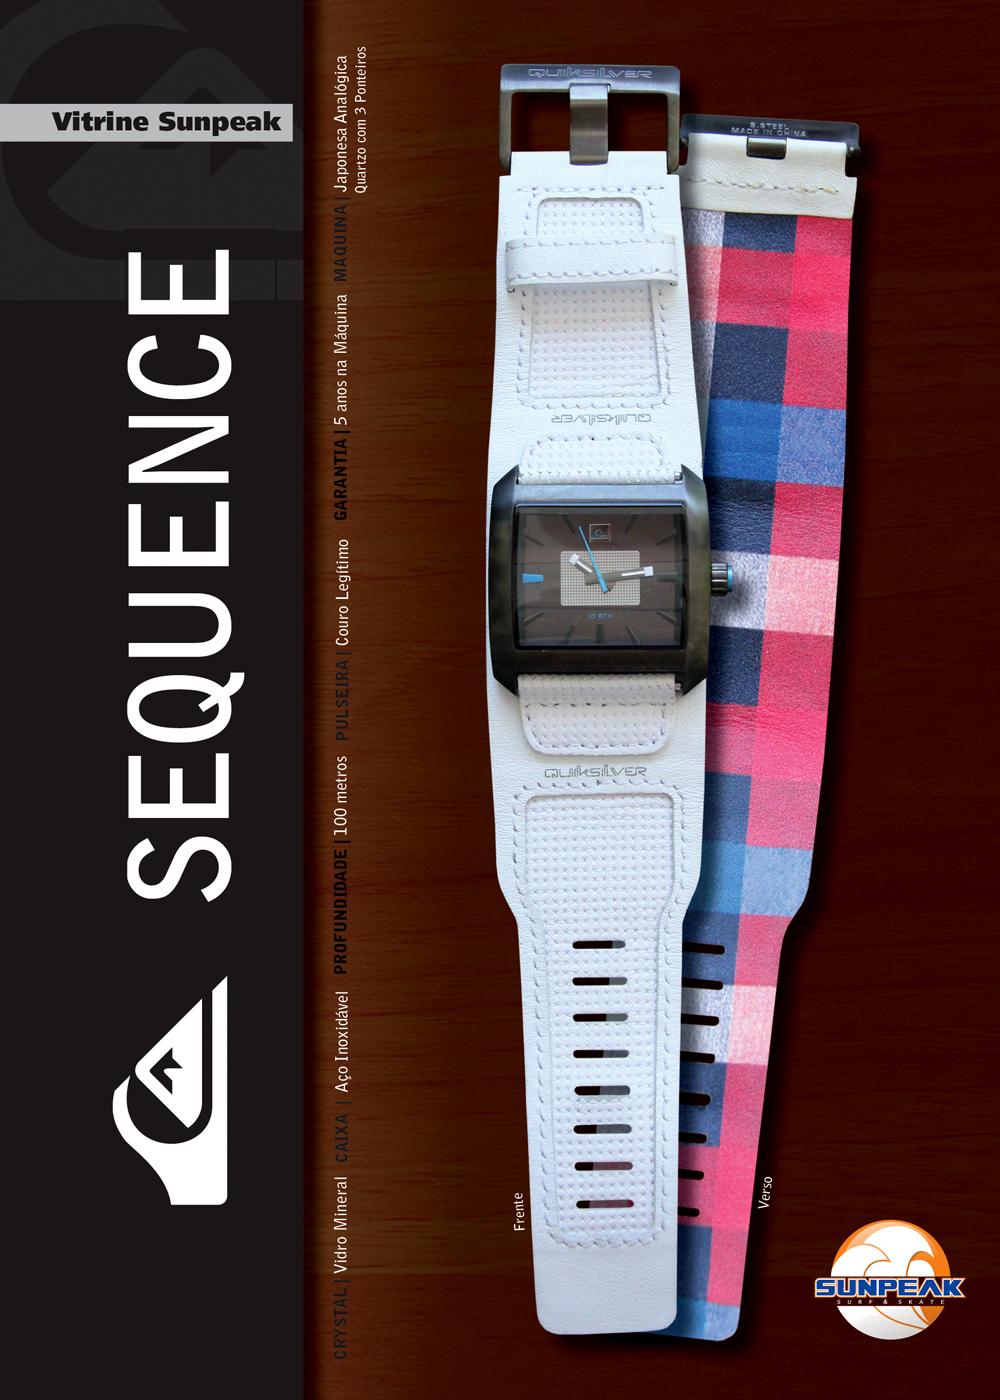 Poderá também gostar de  Quiksilver Limited Edition. Lançamento Relógios  Quiksilver d74d73ff0f